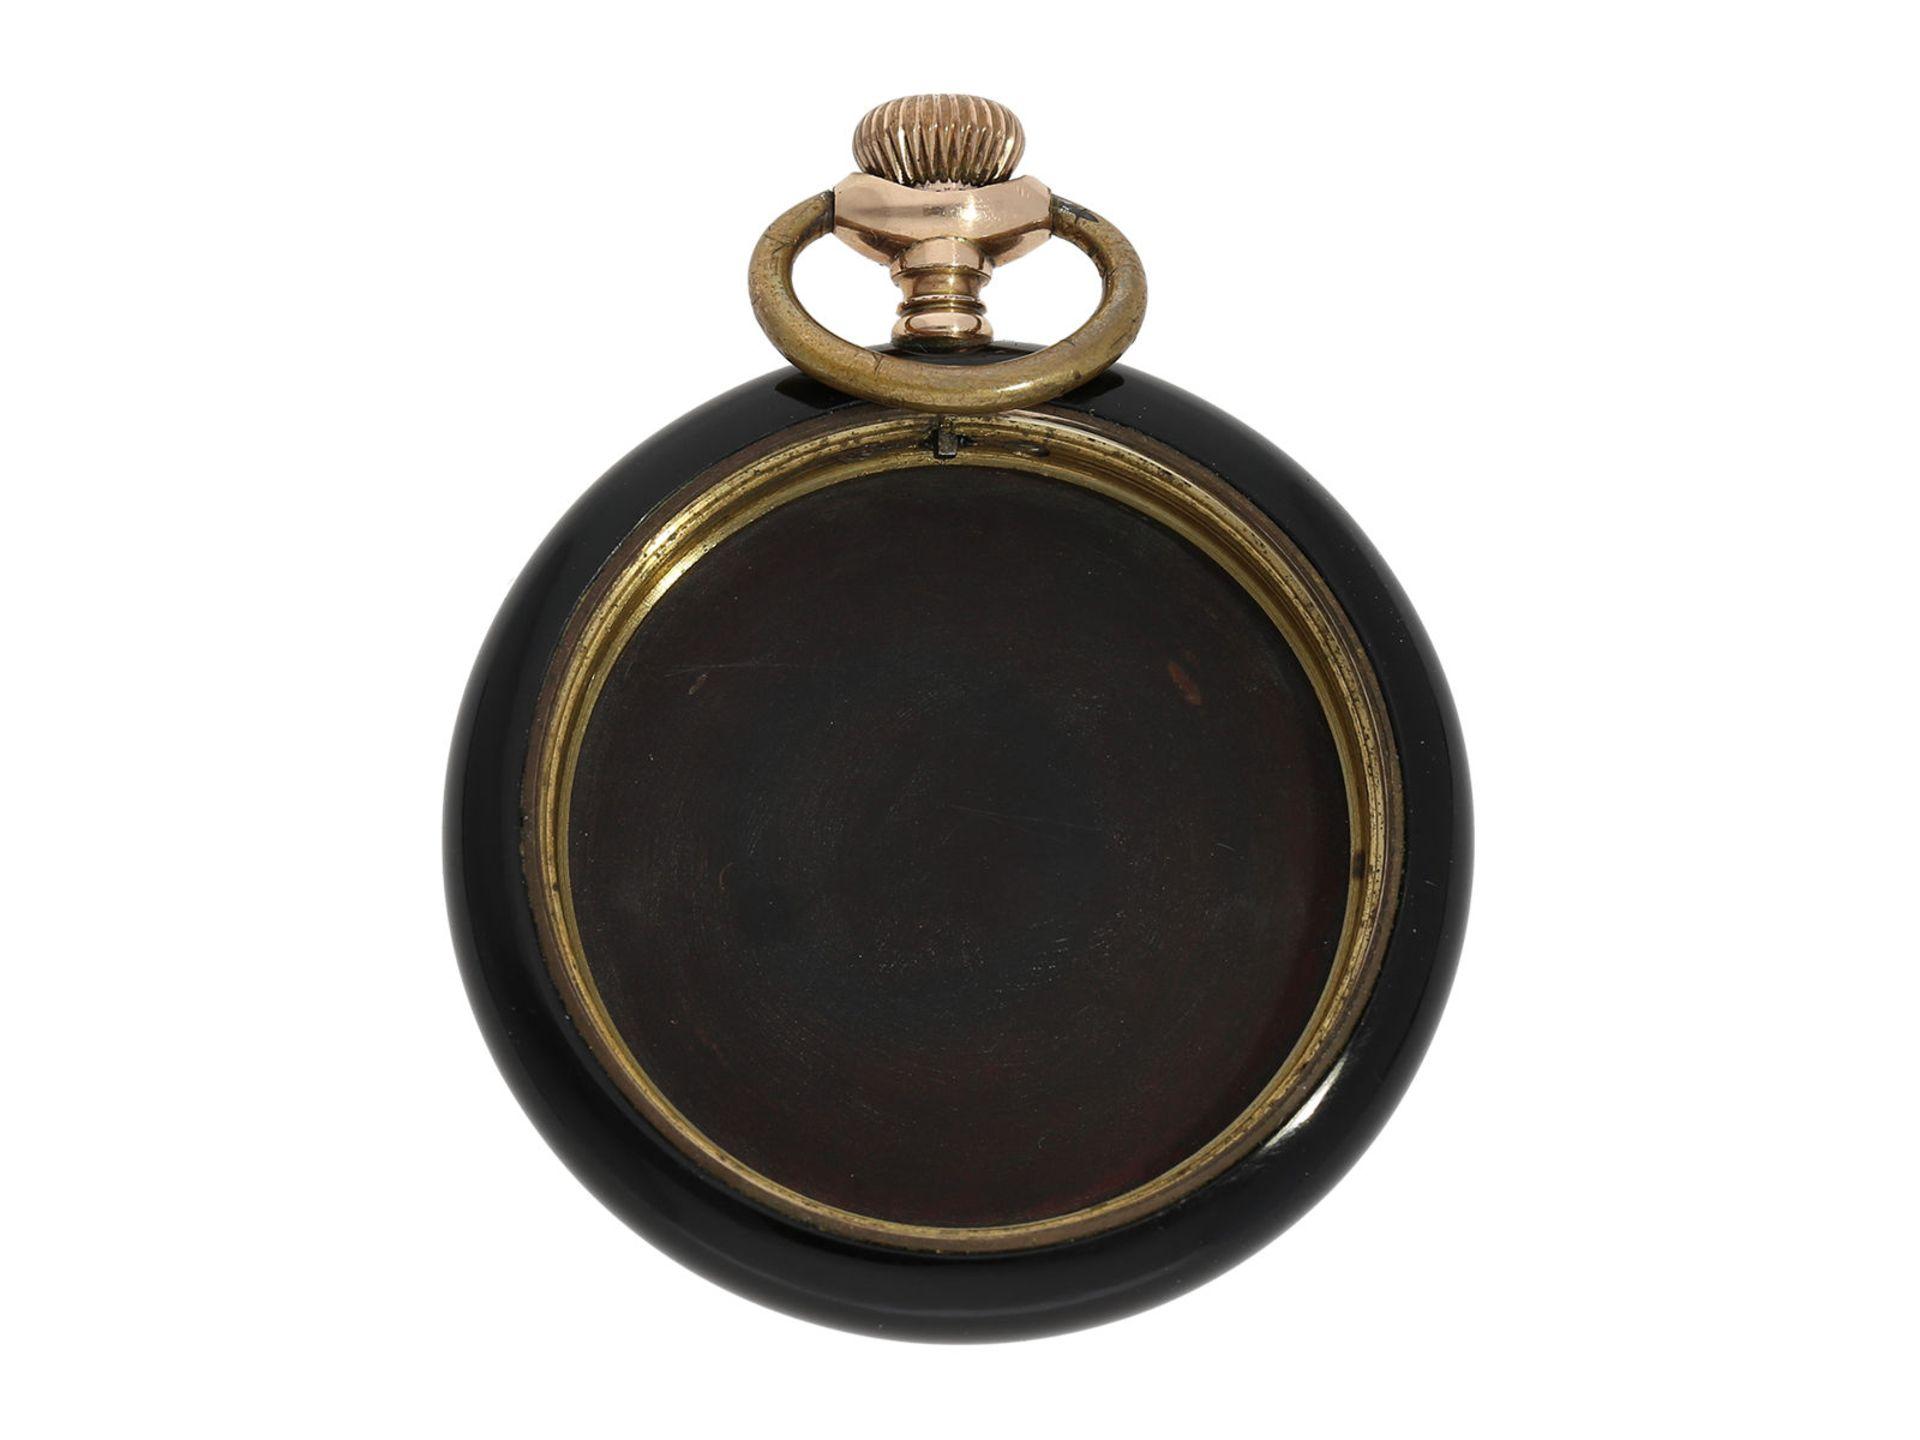 Pocket watch: chronometer Zenith in rare, perfectly preserved onyx case, ca. 1920 - Bild 2 aus 5